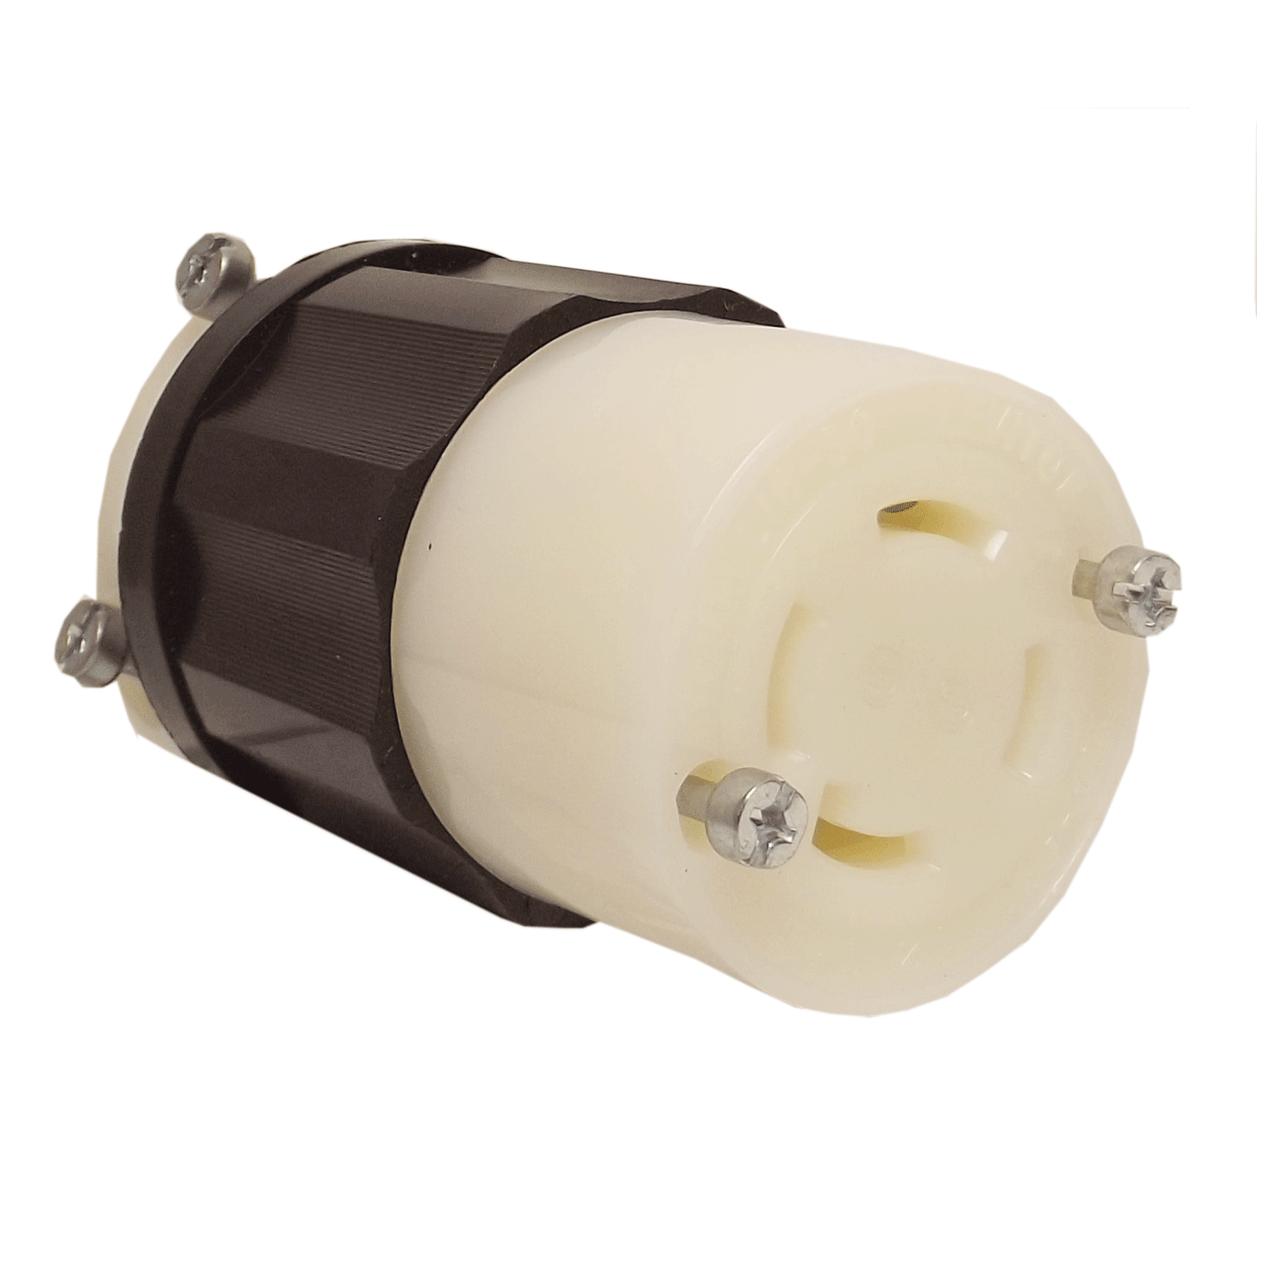 Leviton 2713 30 amp 125 250 volt 3 pole locking connector for 150 amp service entrance cable